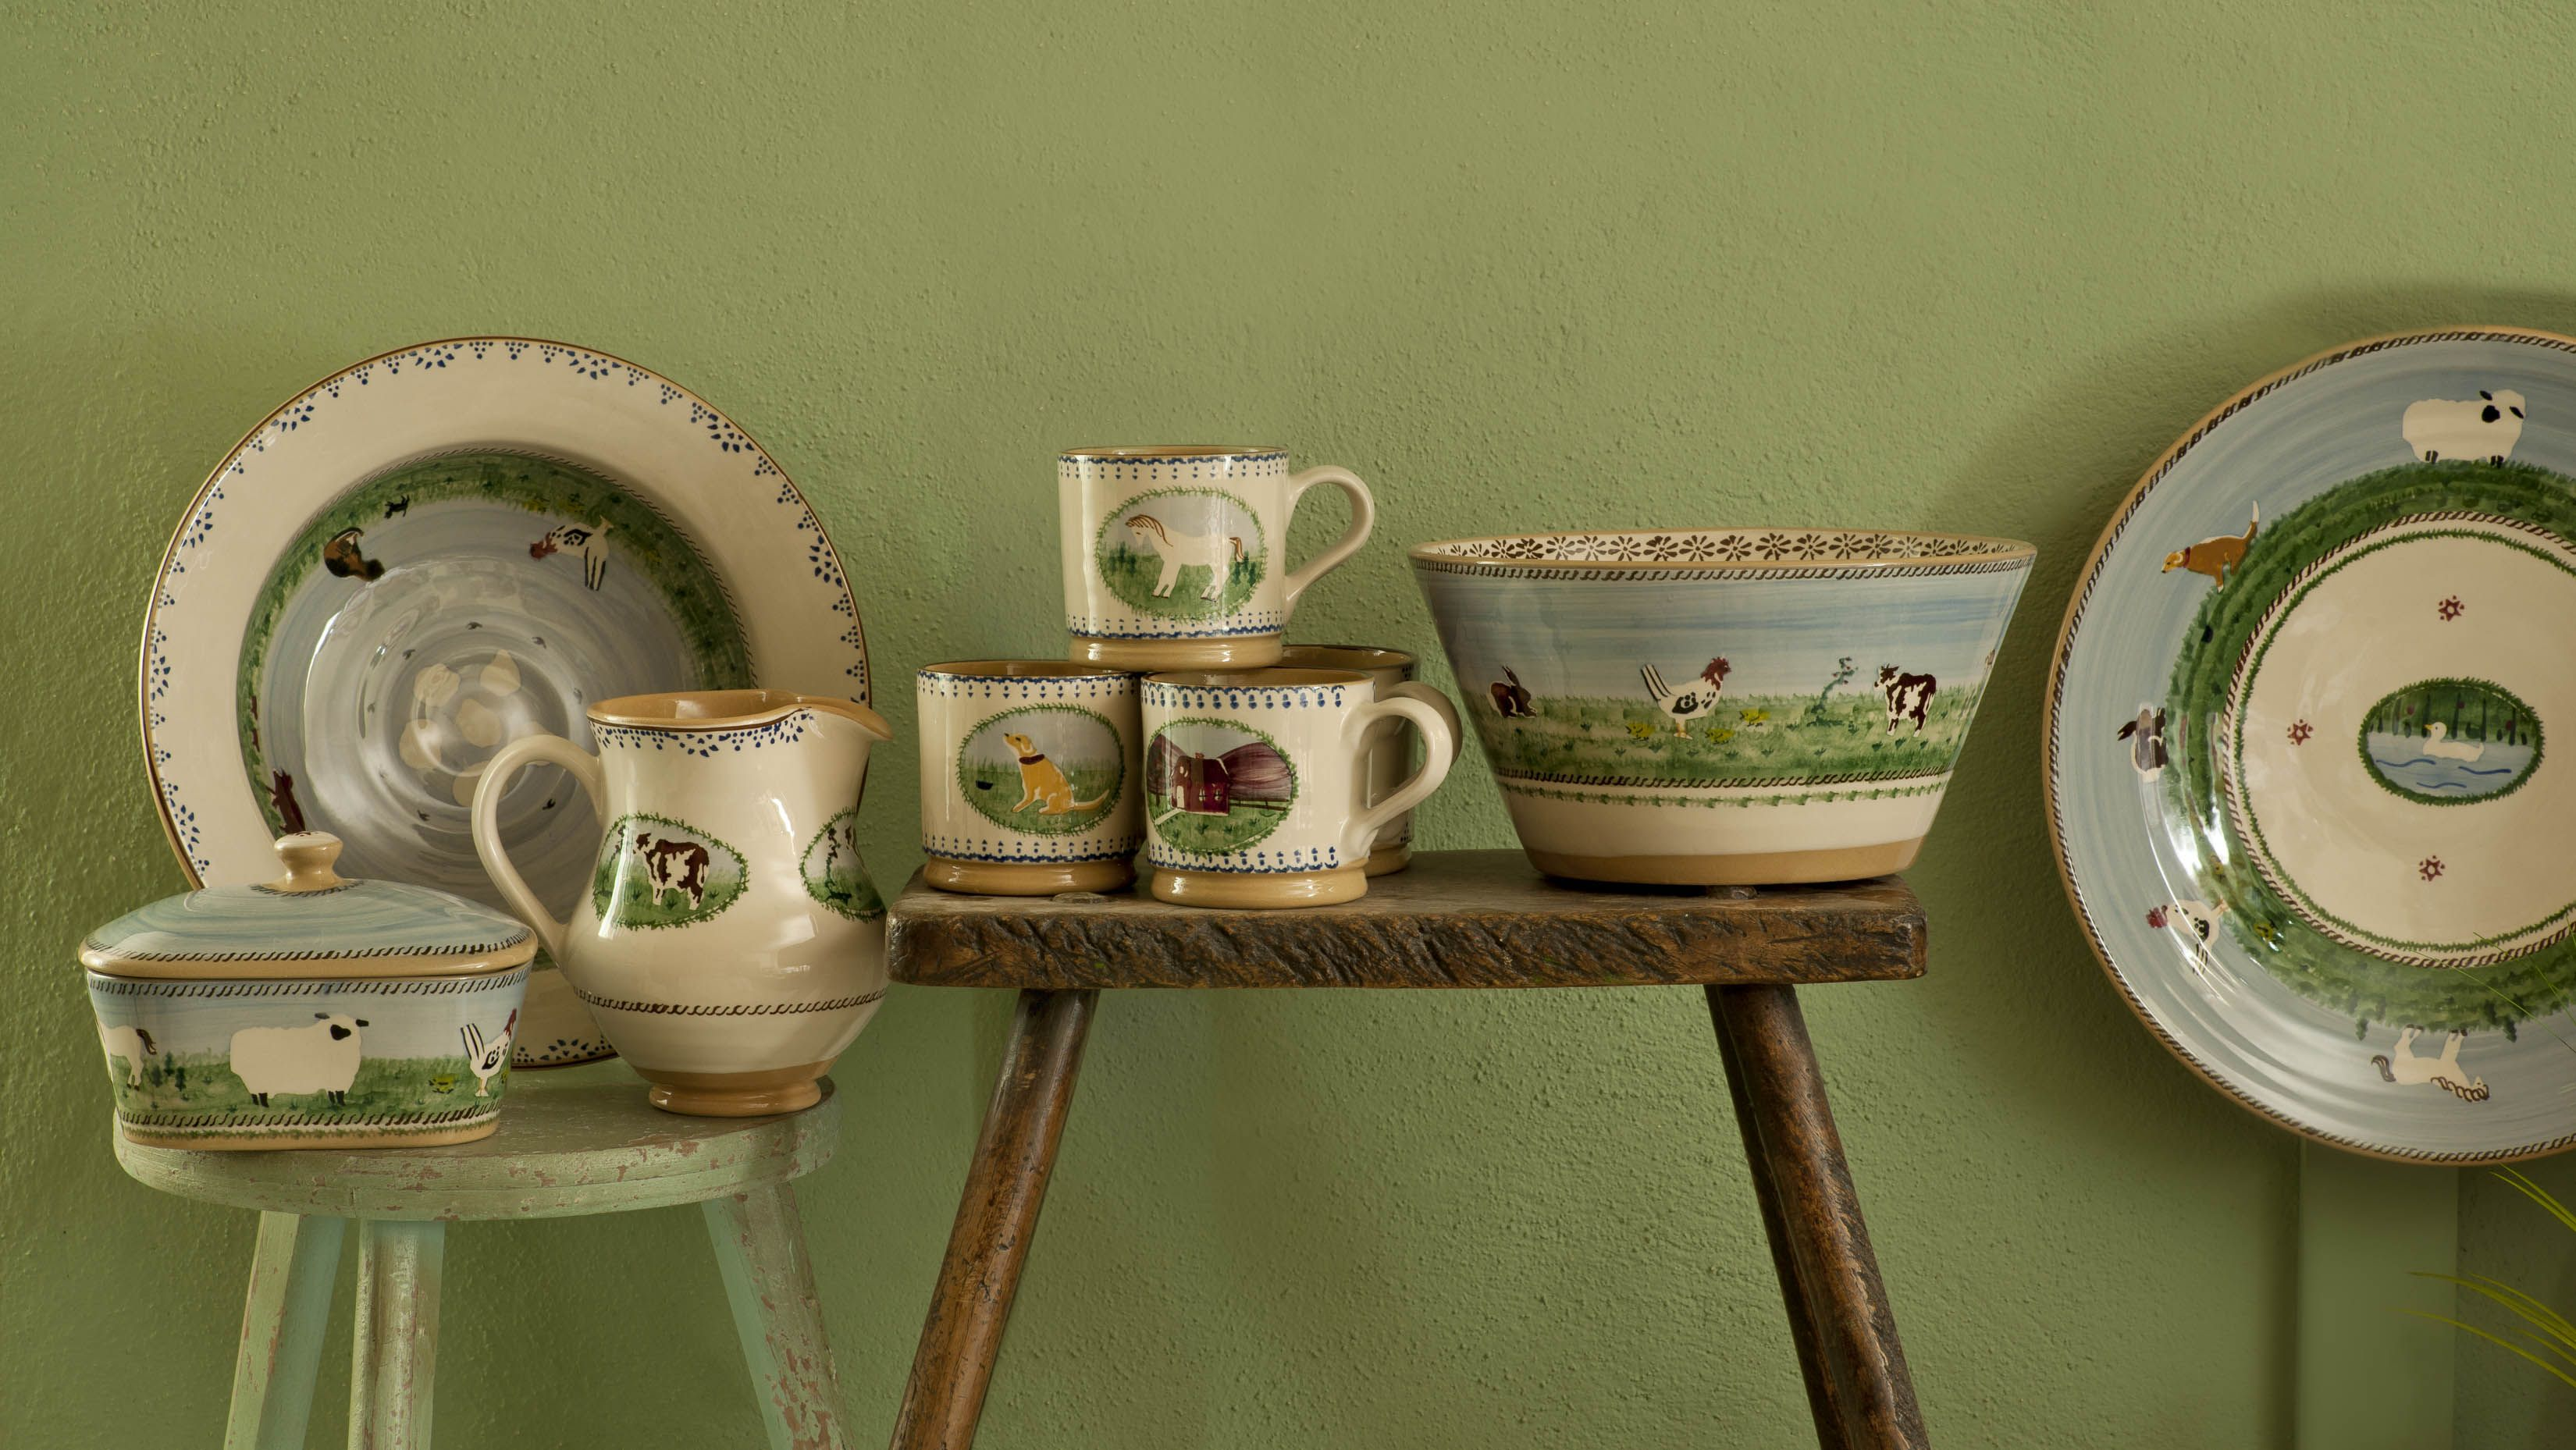 Our Landscape/ Assorted Animals range at Nicholas Mosse Pottery